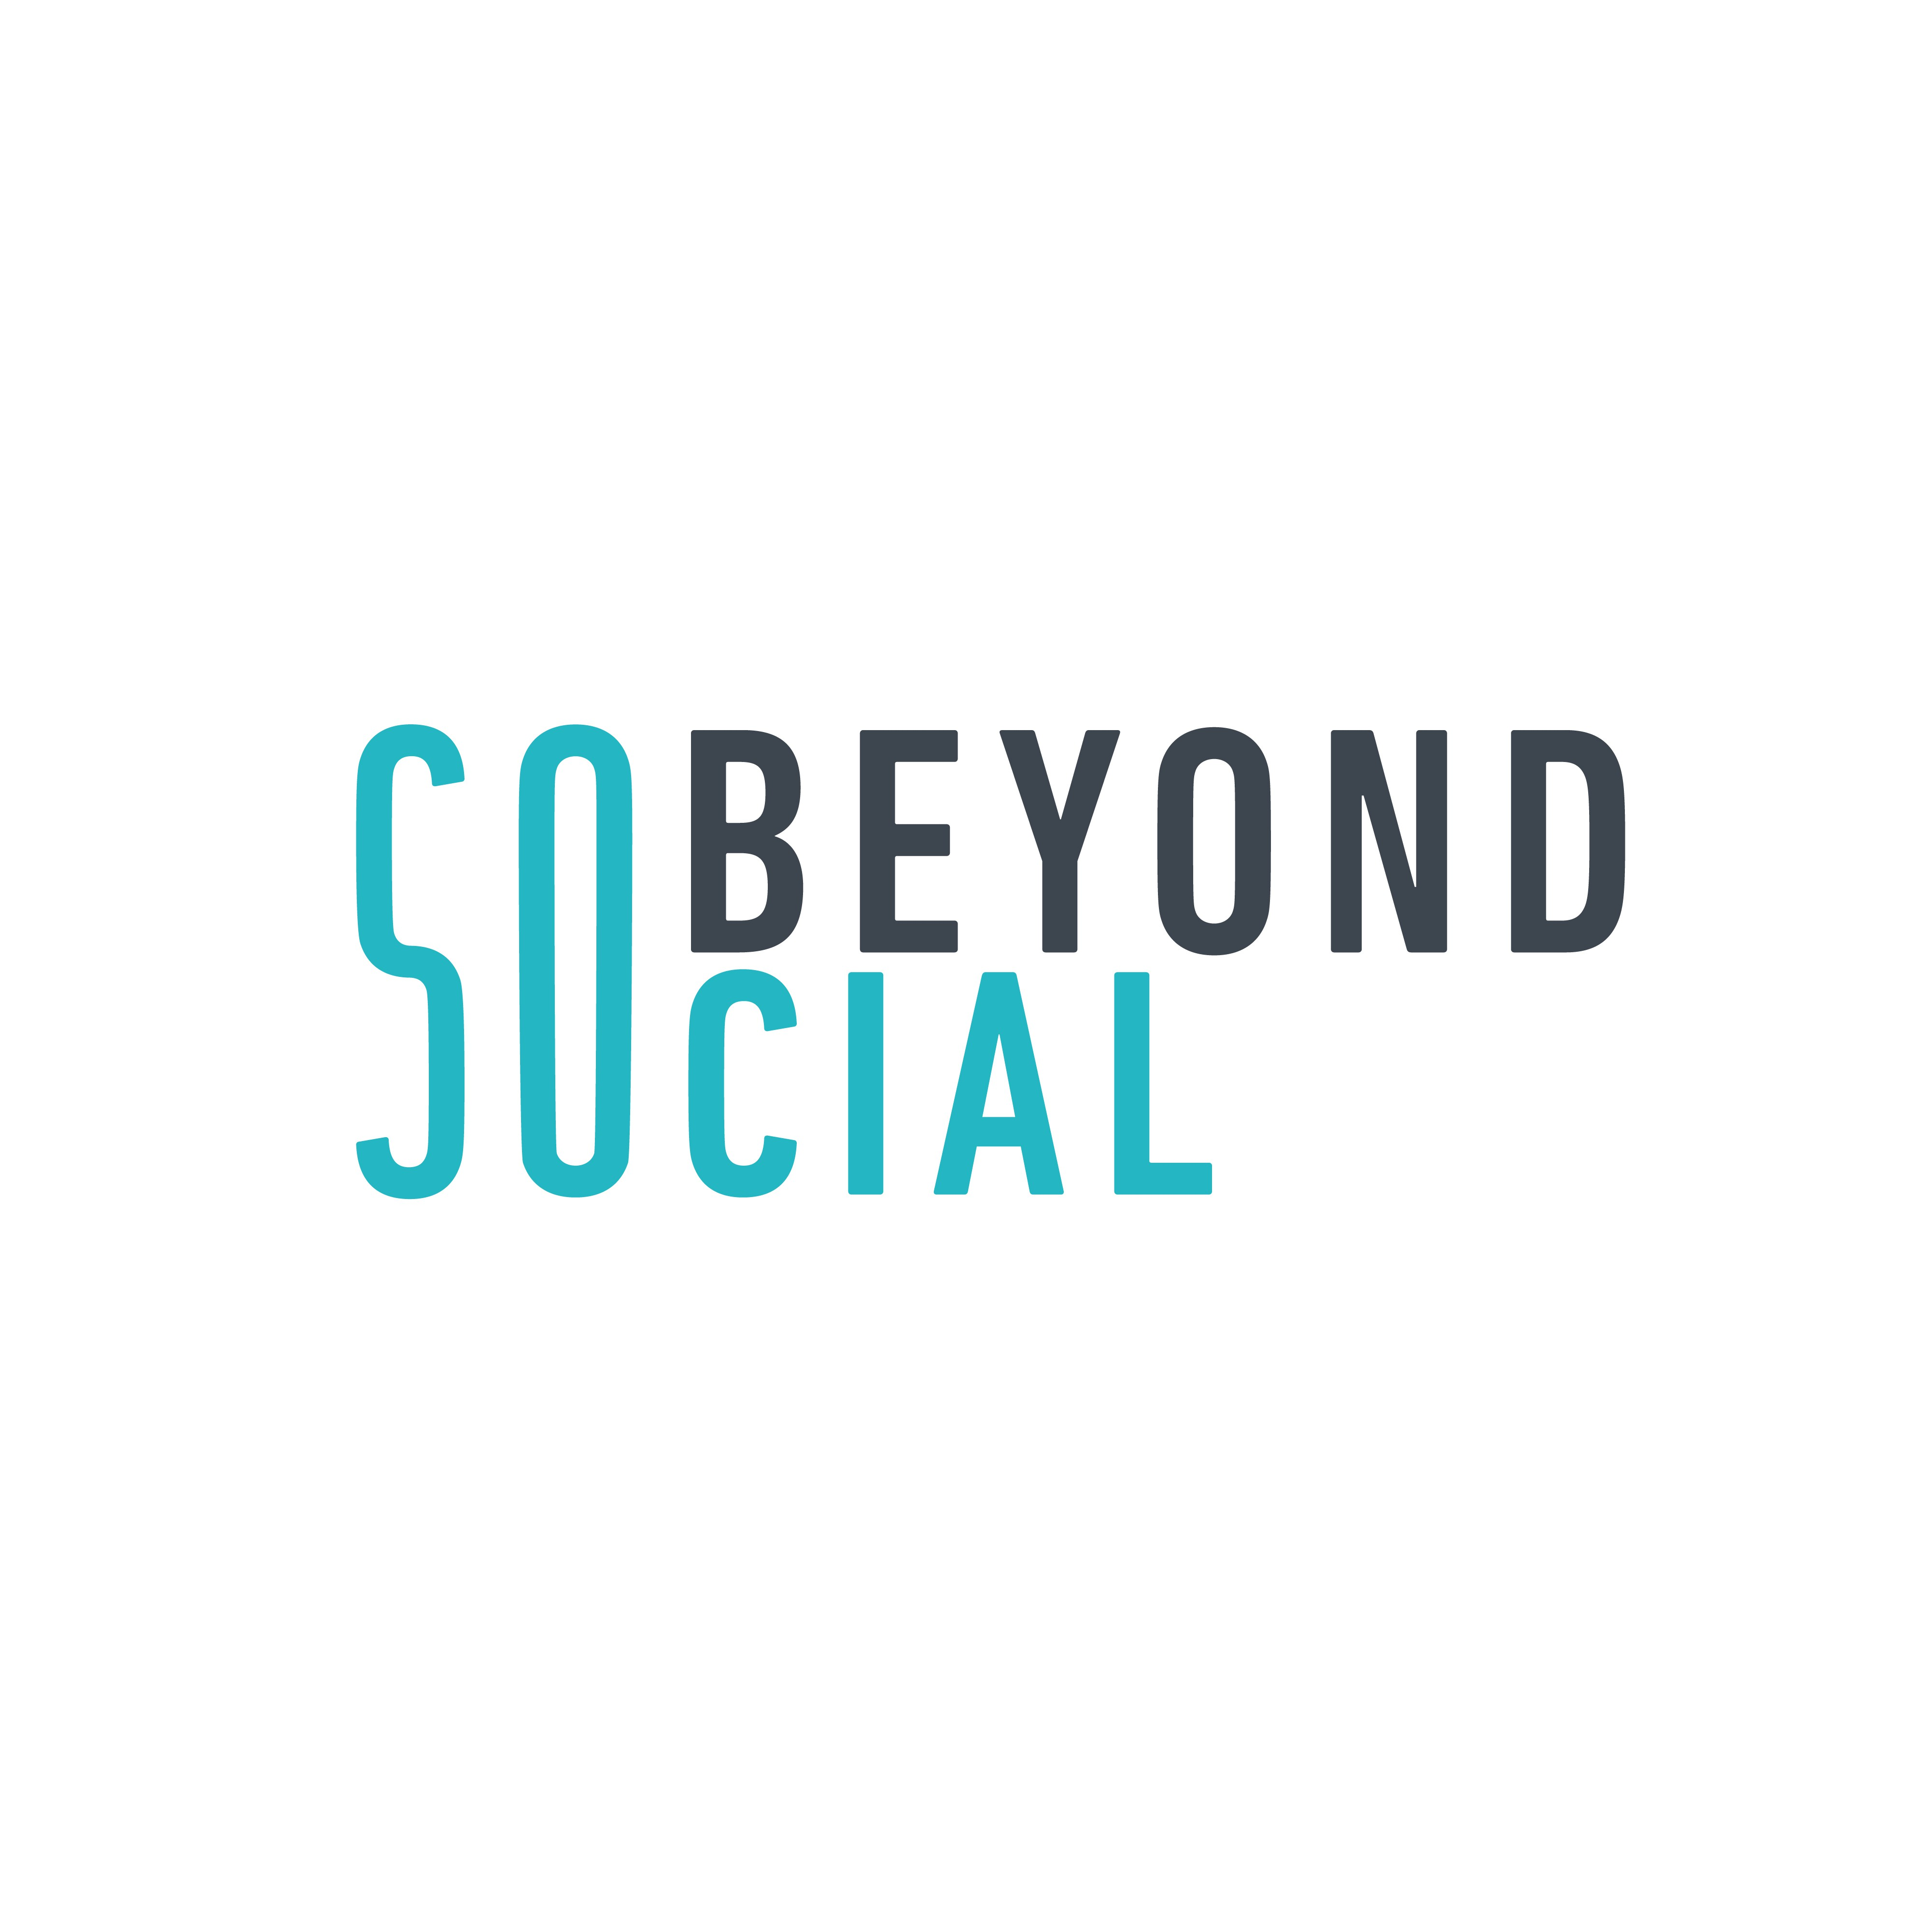 Social Media Management Agency needs logo help!